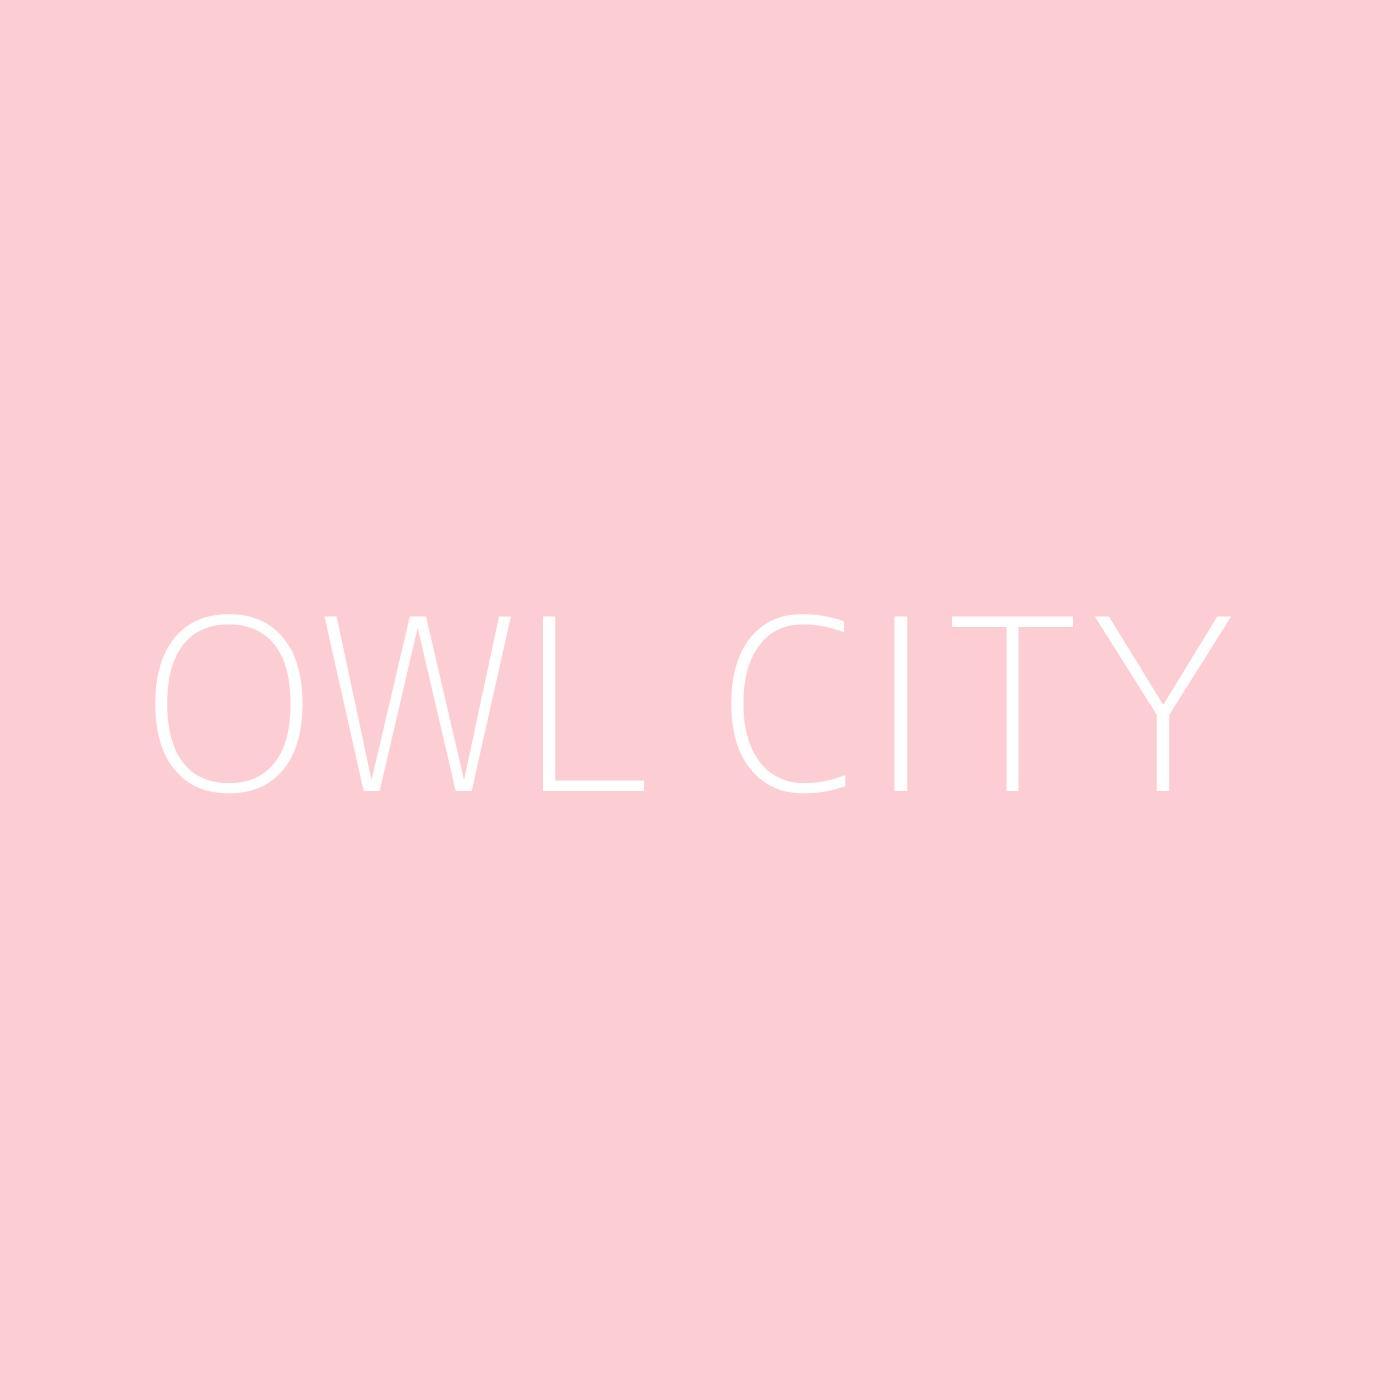 Owl City Playlist Artwork